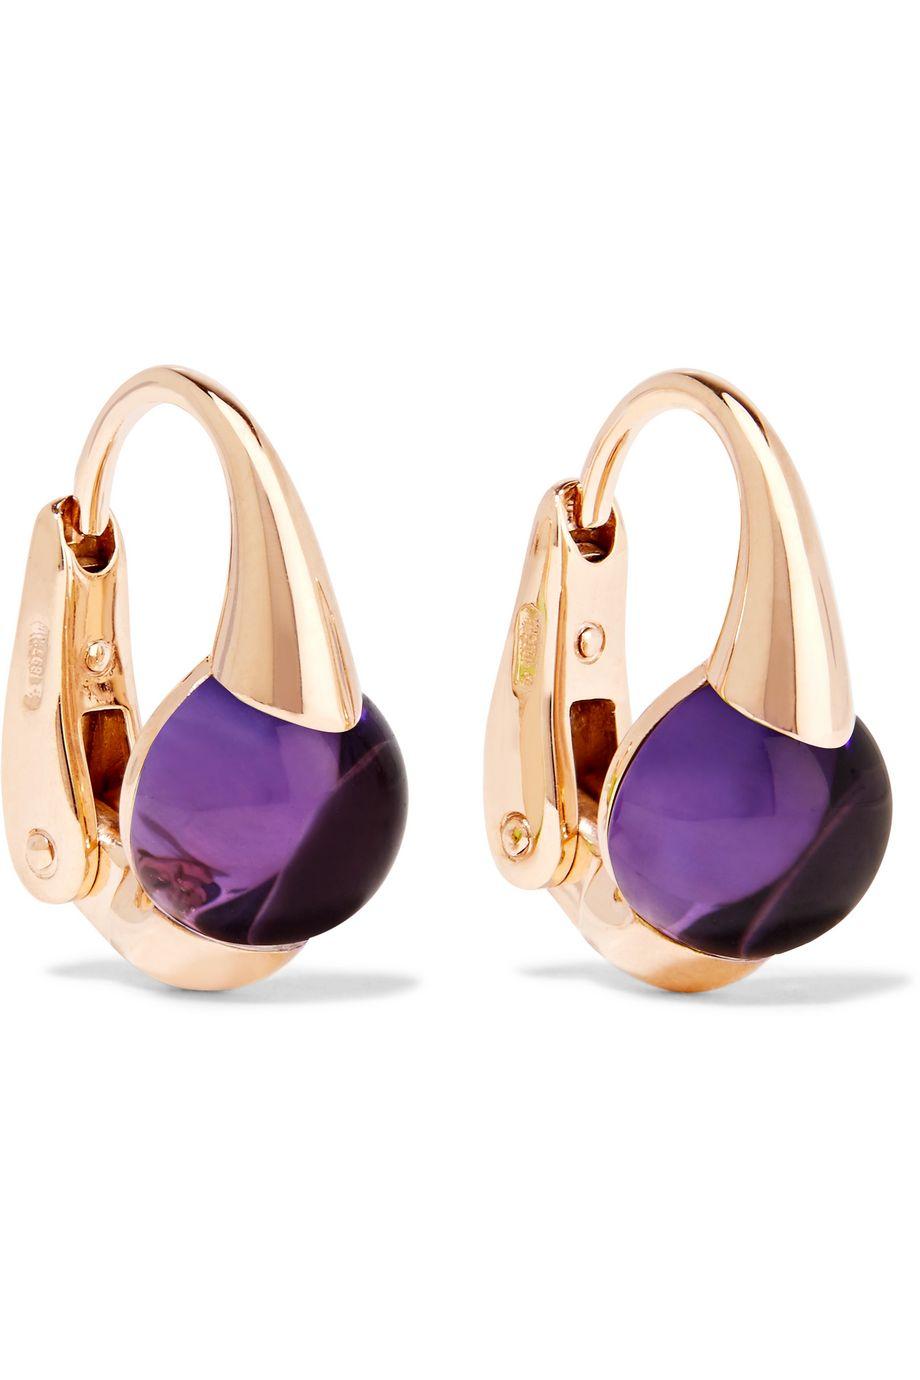 Pomellato M'ama Non M'ama 18-karat rose gold amethyst earrings